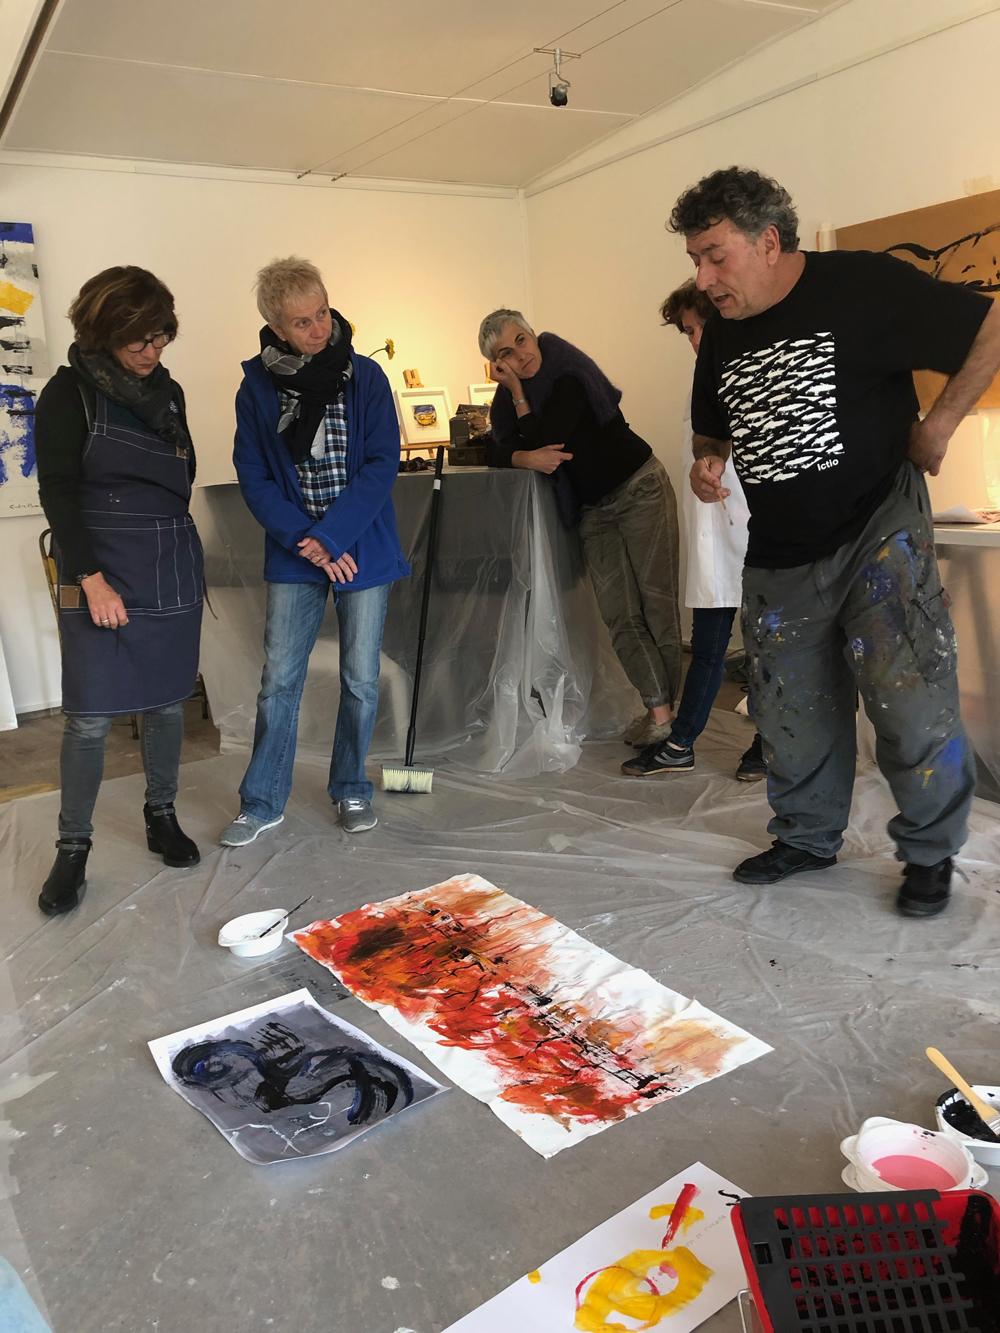 Atelier de peinture - Carles Bros